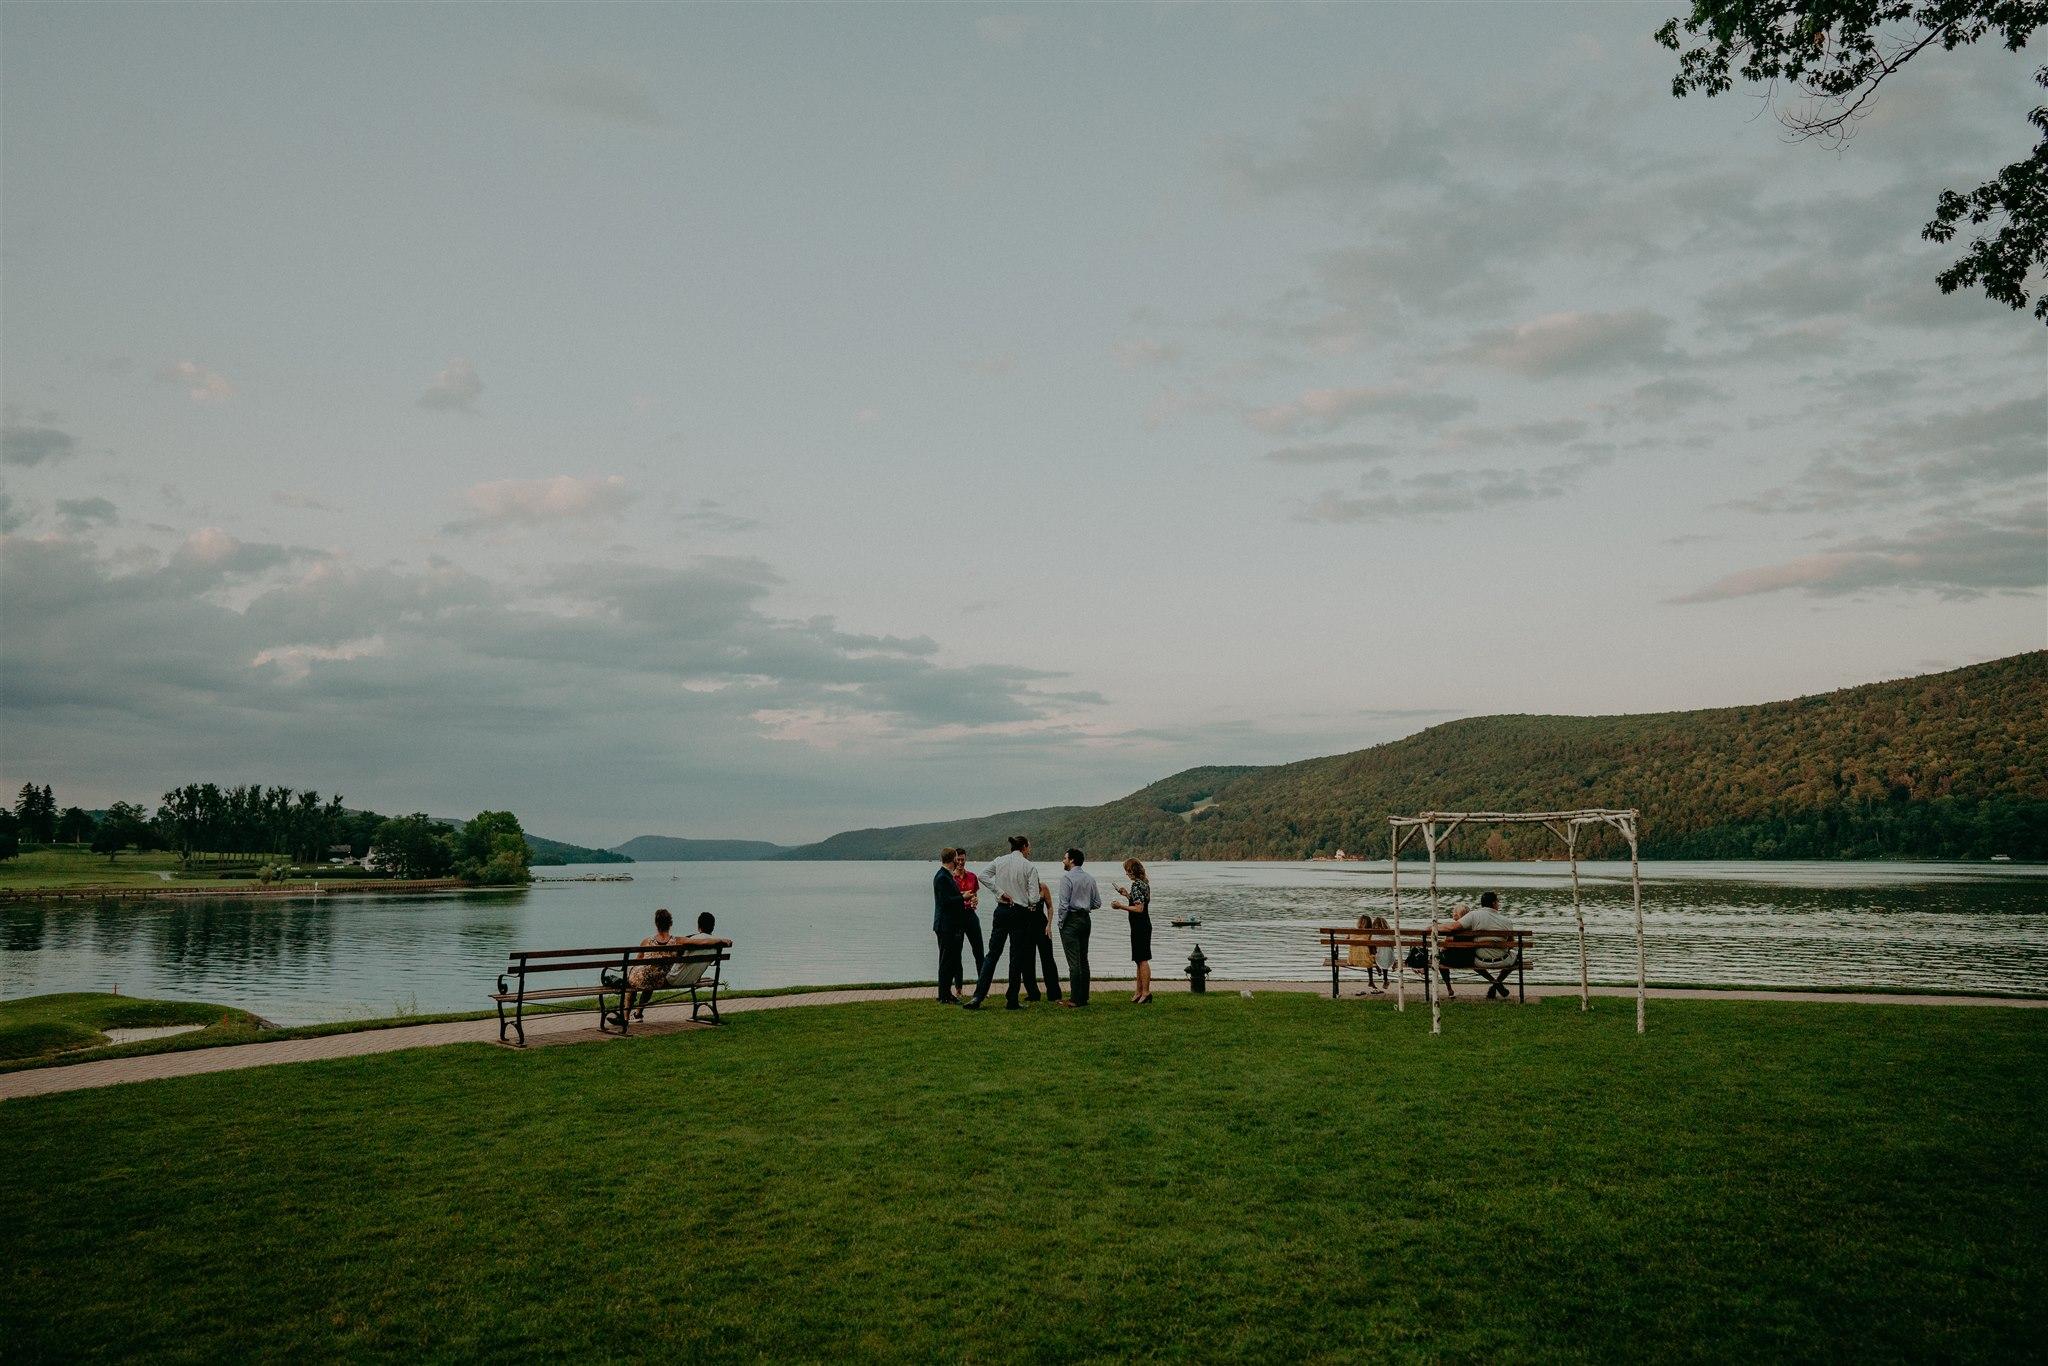 Chellise_Michael_Photography_Hudson_Valley_Wedding_Photographer_Otesaga_Hotel-6113.jpg